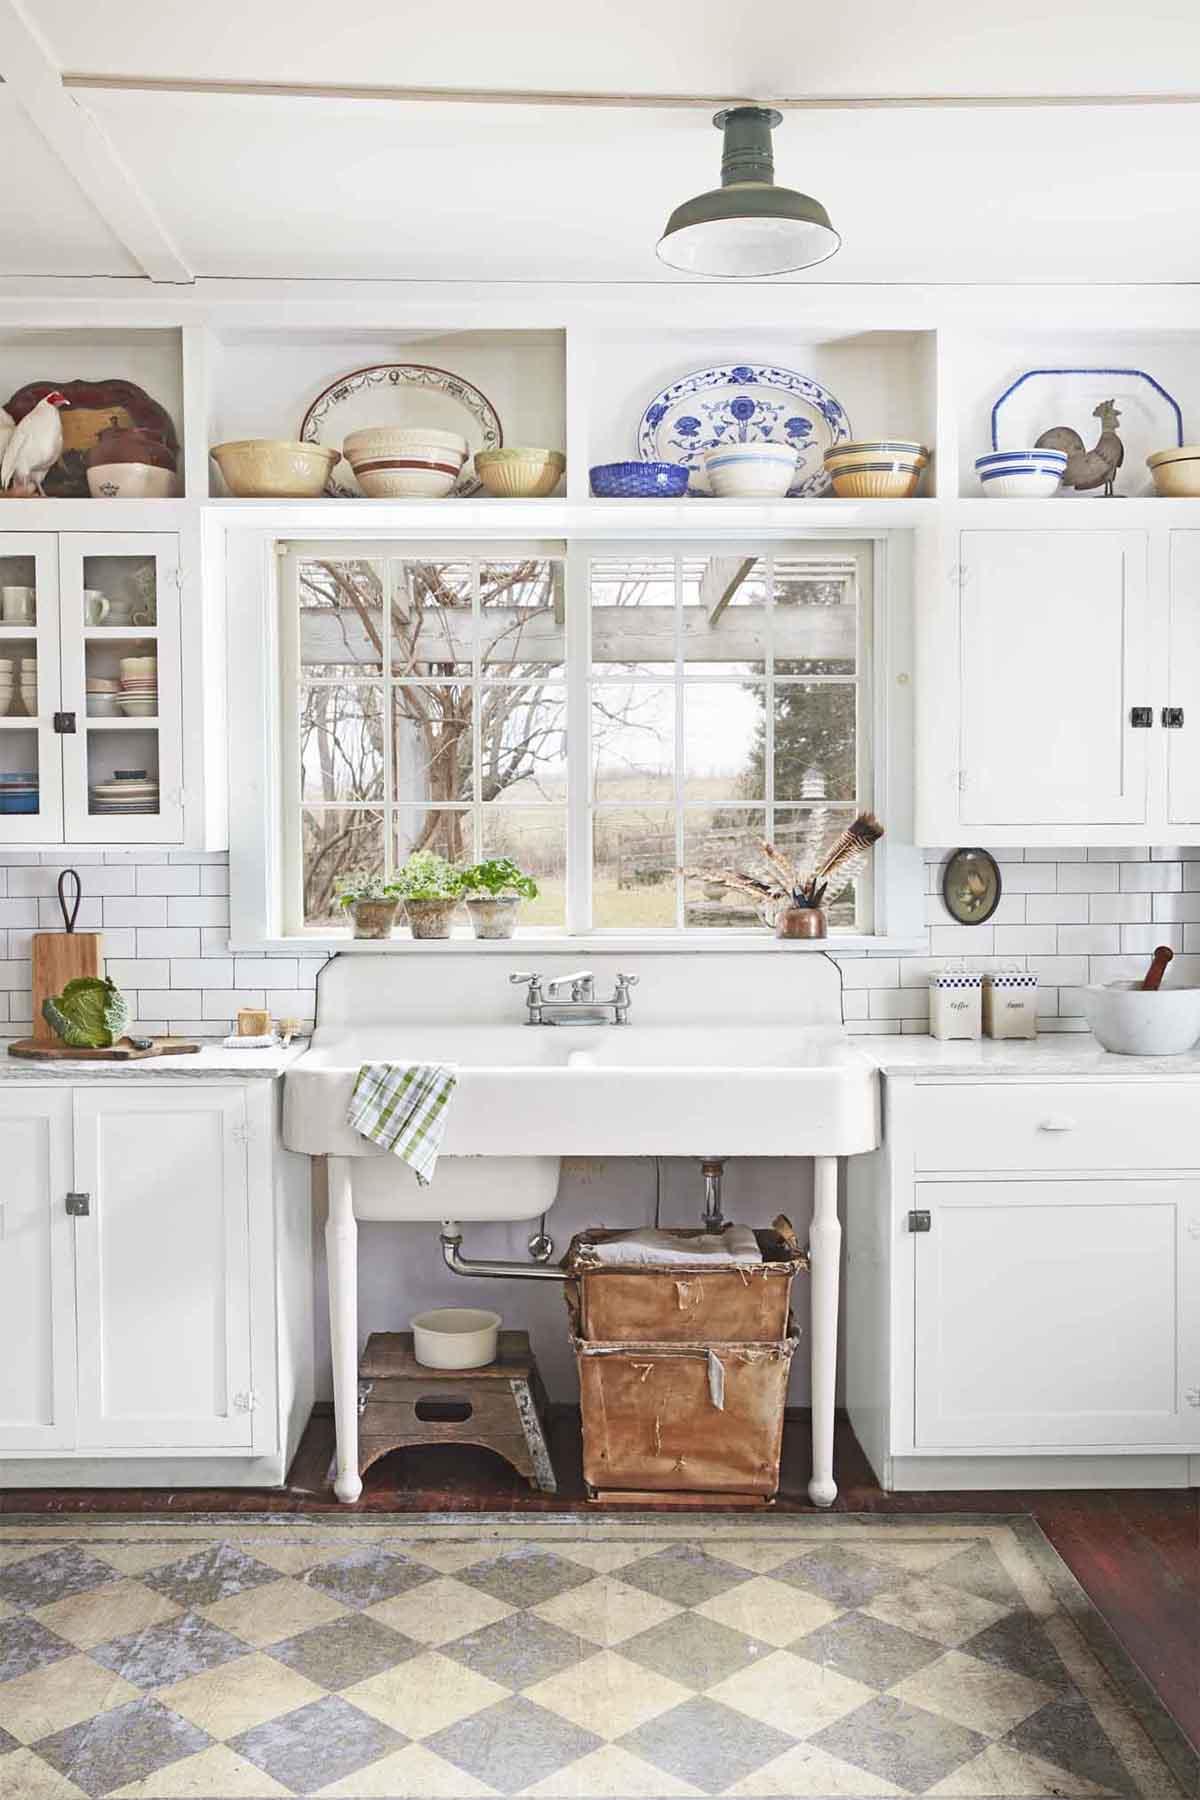 34 Best Vintage Kitchen Decor Ideas and Designs for 2020 on Kitchen Decoration Ideas  id=72841